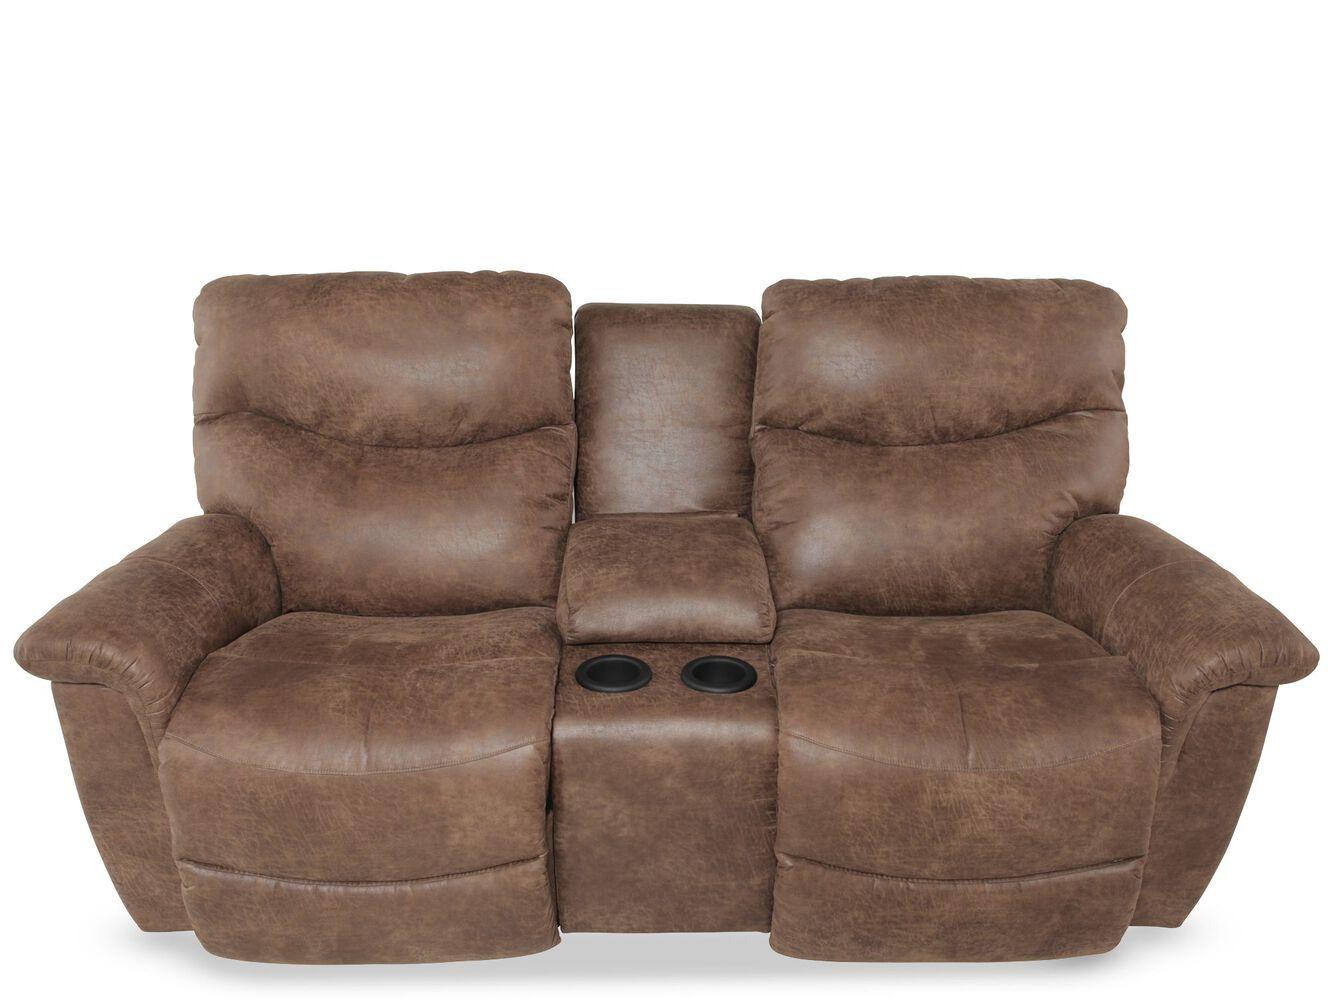 La z boy recliners buy one get one - La Z Boy James Silt Performance Leather Double Recliner